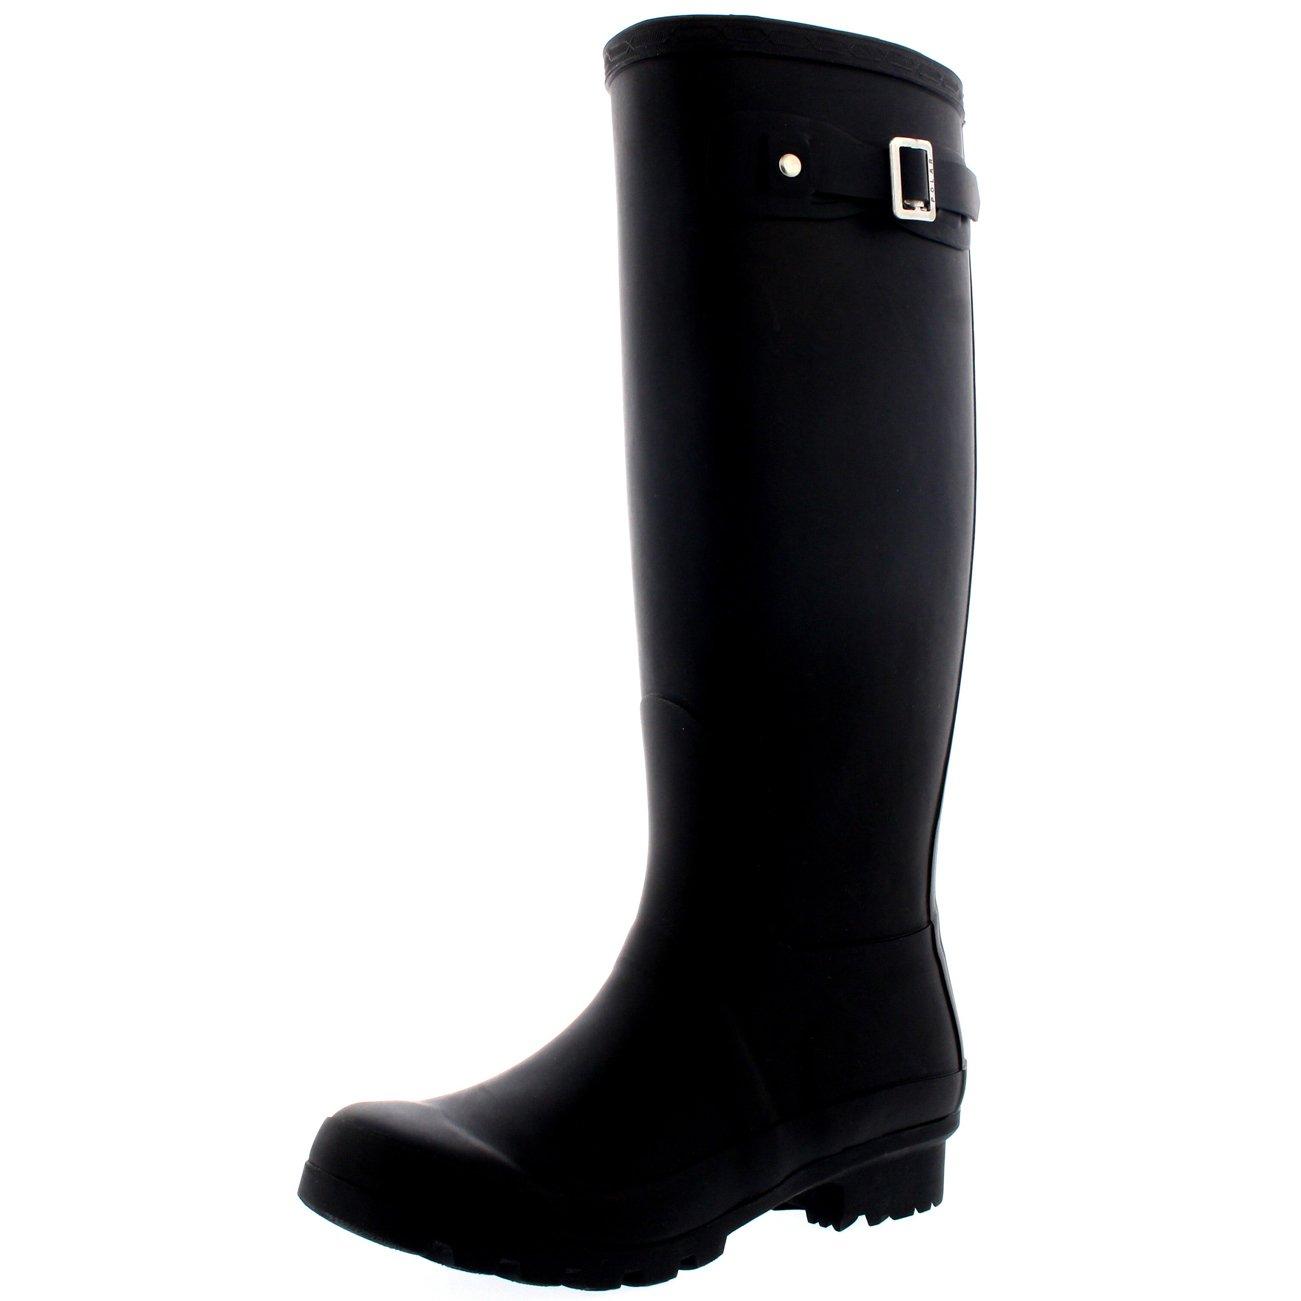 Womens Original Tall Snow Winter Wellington Waterproof Rain Wellies Boot - Black - 9 - 40 - CD0001